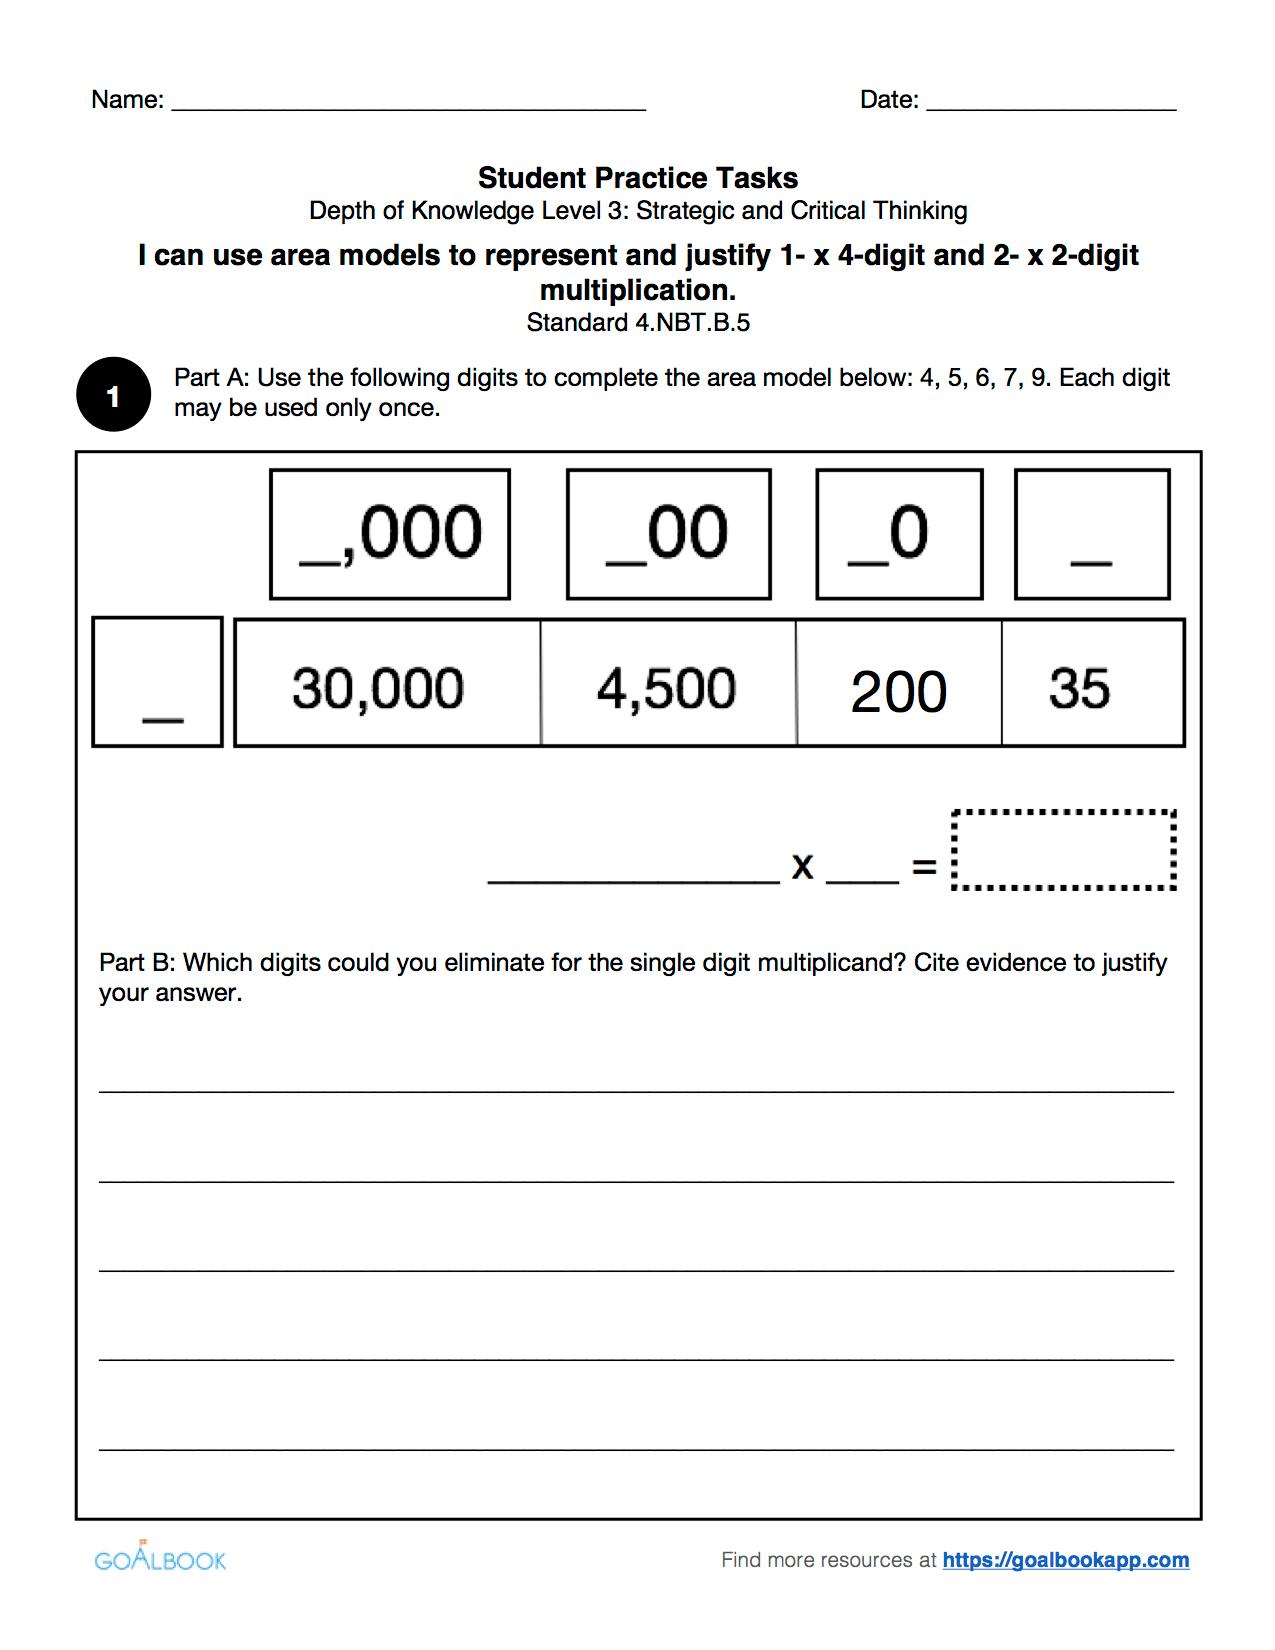 4 Nbt 5 Calculate And Explain Multiplication